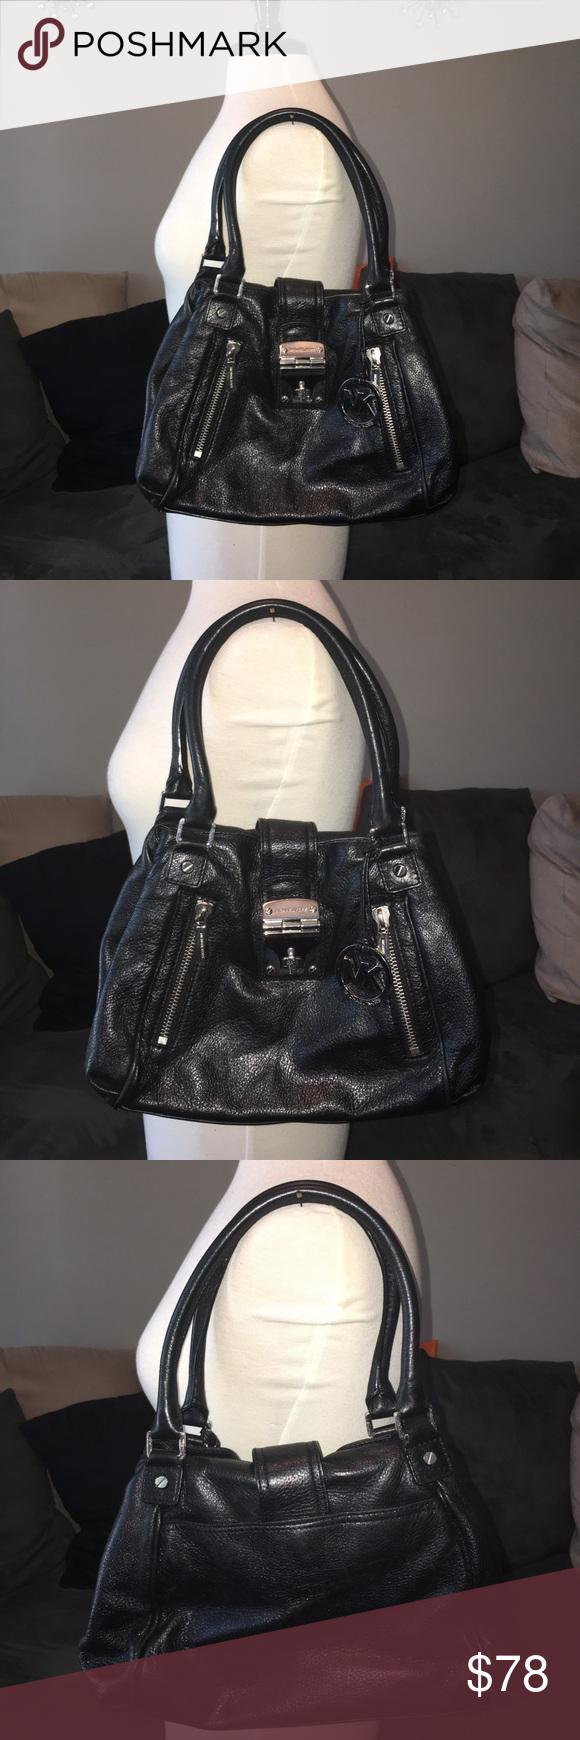 7e84ce6af874 Gorgeous and Real Michael Kors purse. Gorgeous and Real Michael Kors purse,  code AP-1106, genuine black leather, silver hardware, Black Monogram inside.